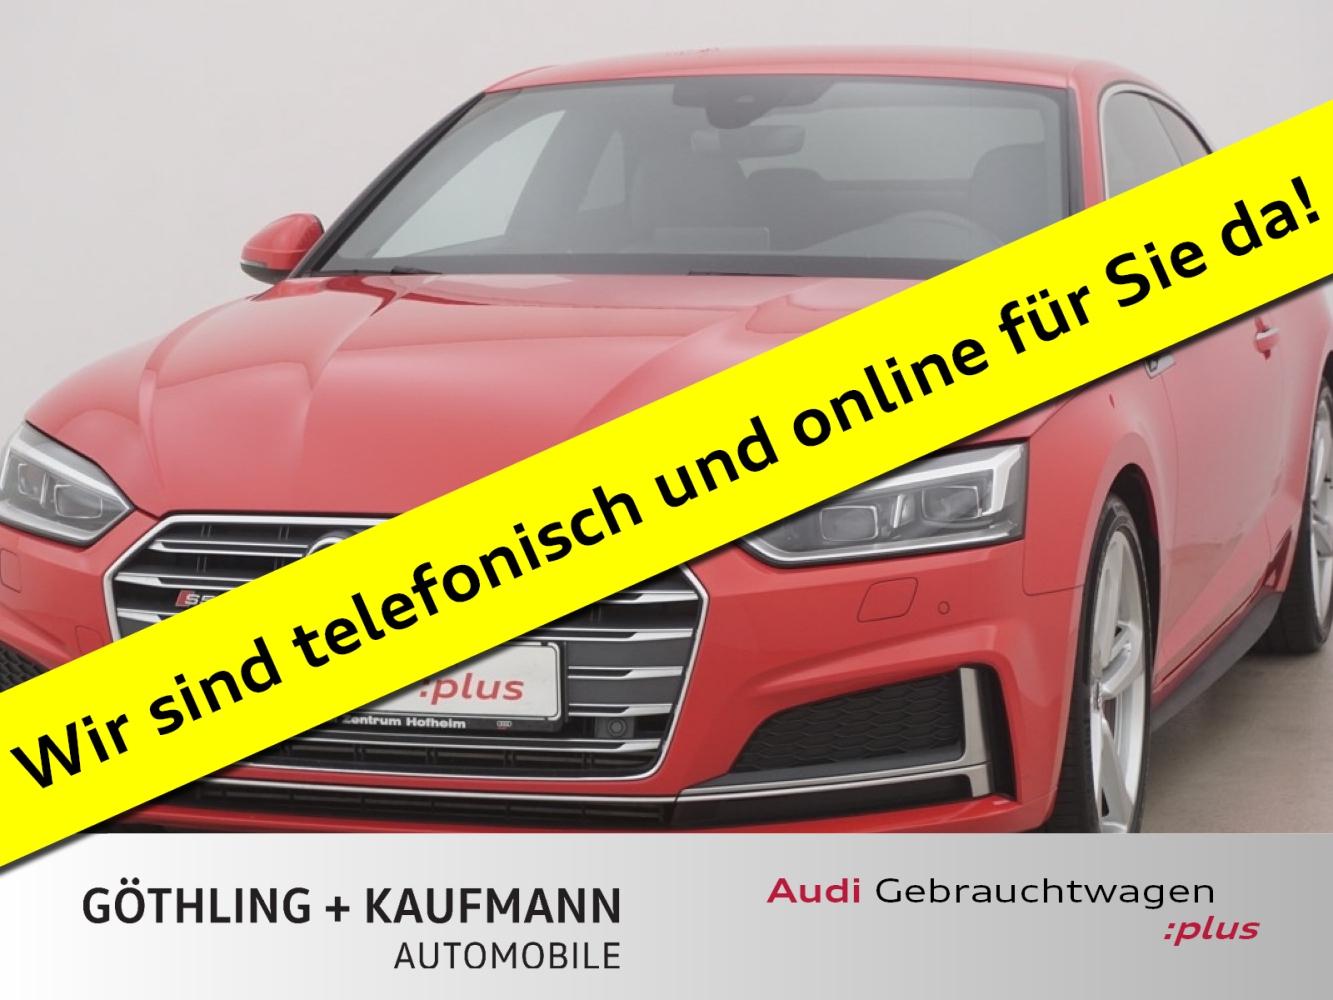 Audi S5 Coupé 3.0 TFSI qu tiptro. 260kW*Matrix*Virtua, Jahr 2017, Benzin